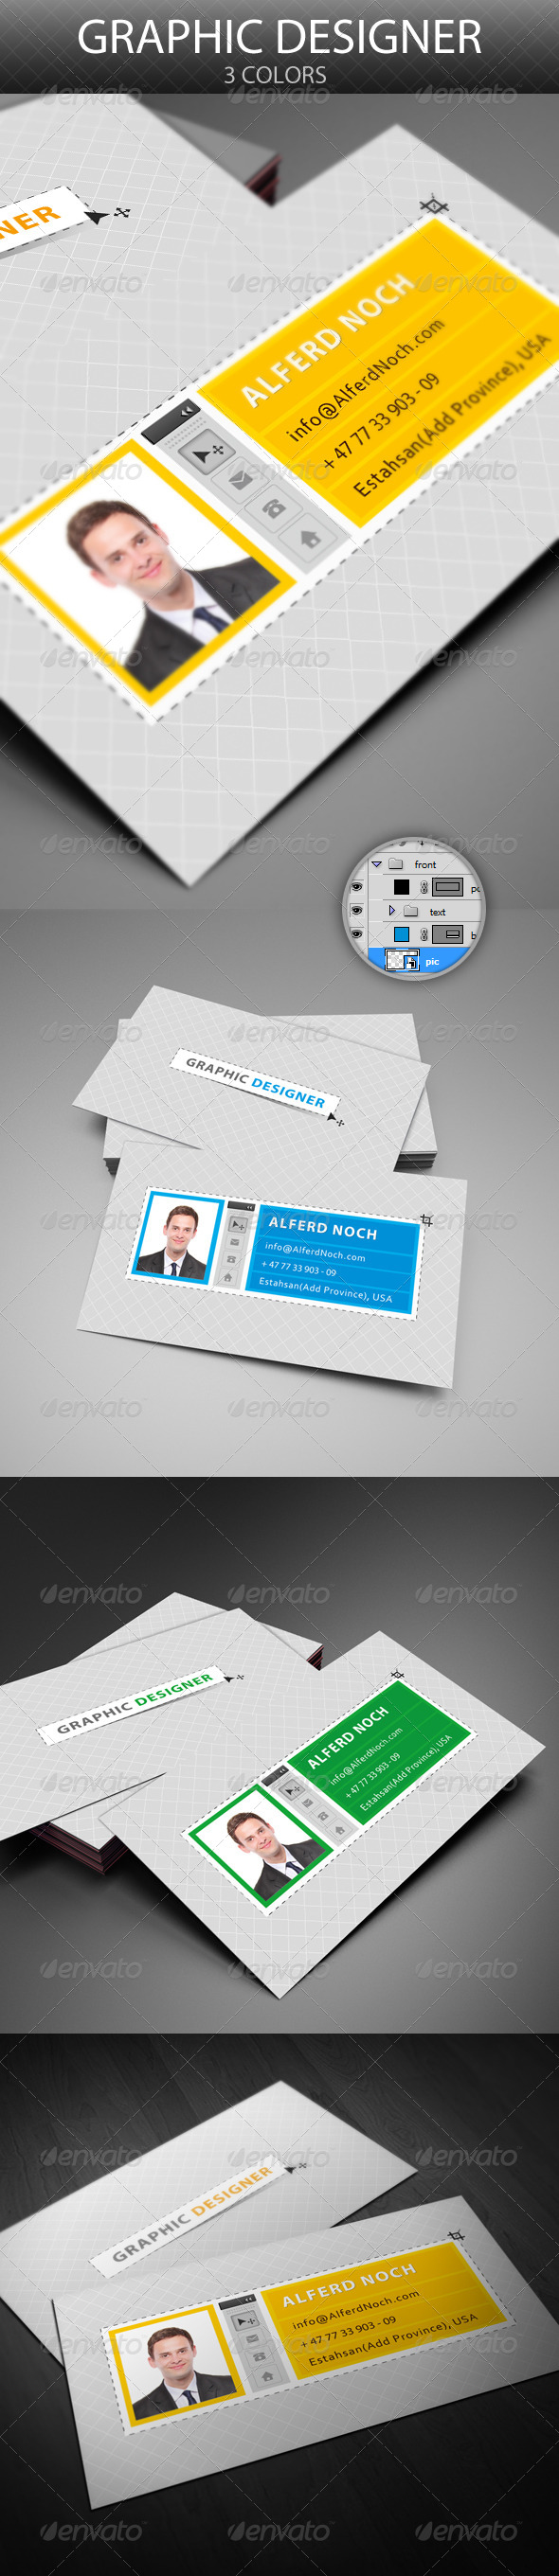 GraphicRiver Graphic Designer Photoshop Toolbar 4635276